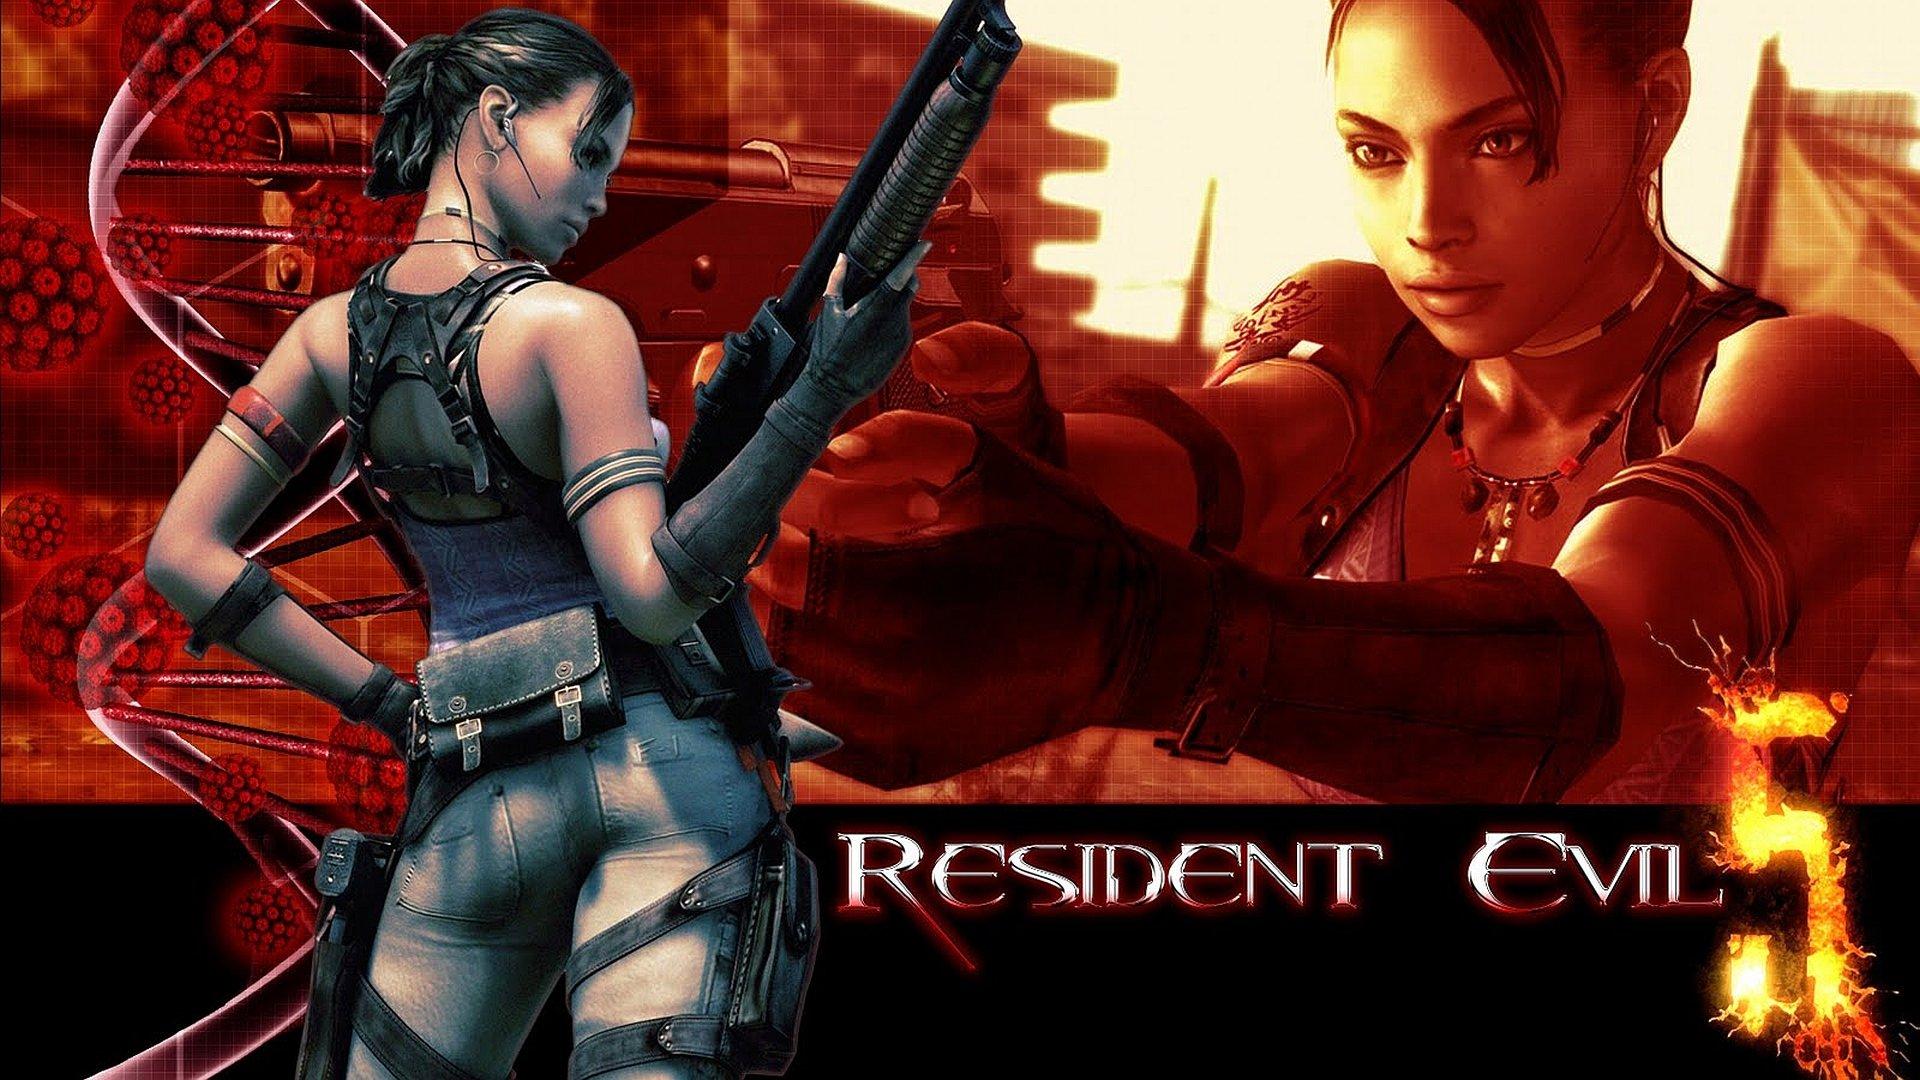 High Resolution Resident Evil 5 Hd 1920x1080 Wallpaper Id 50322